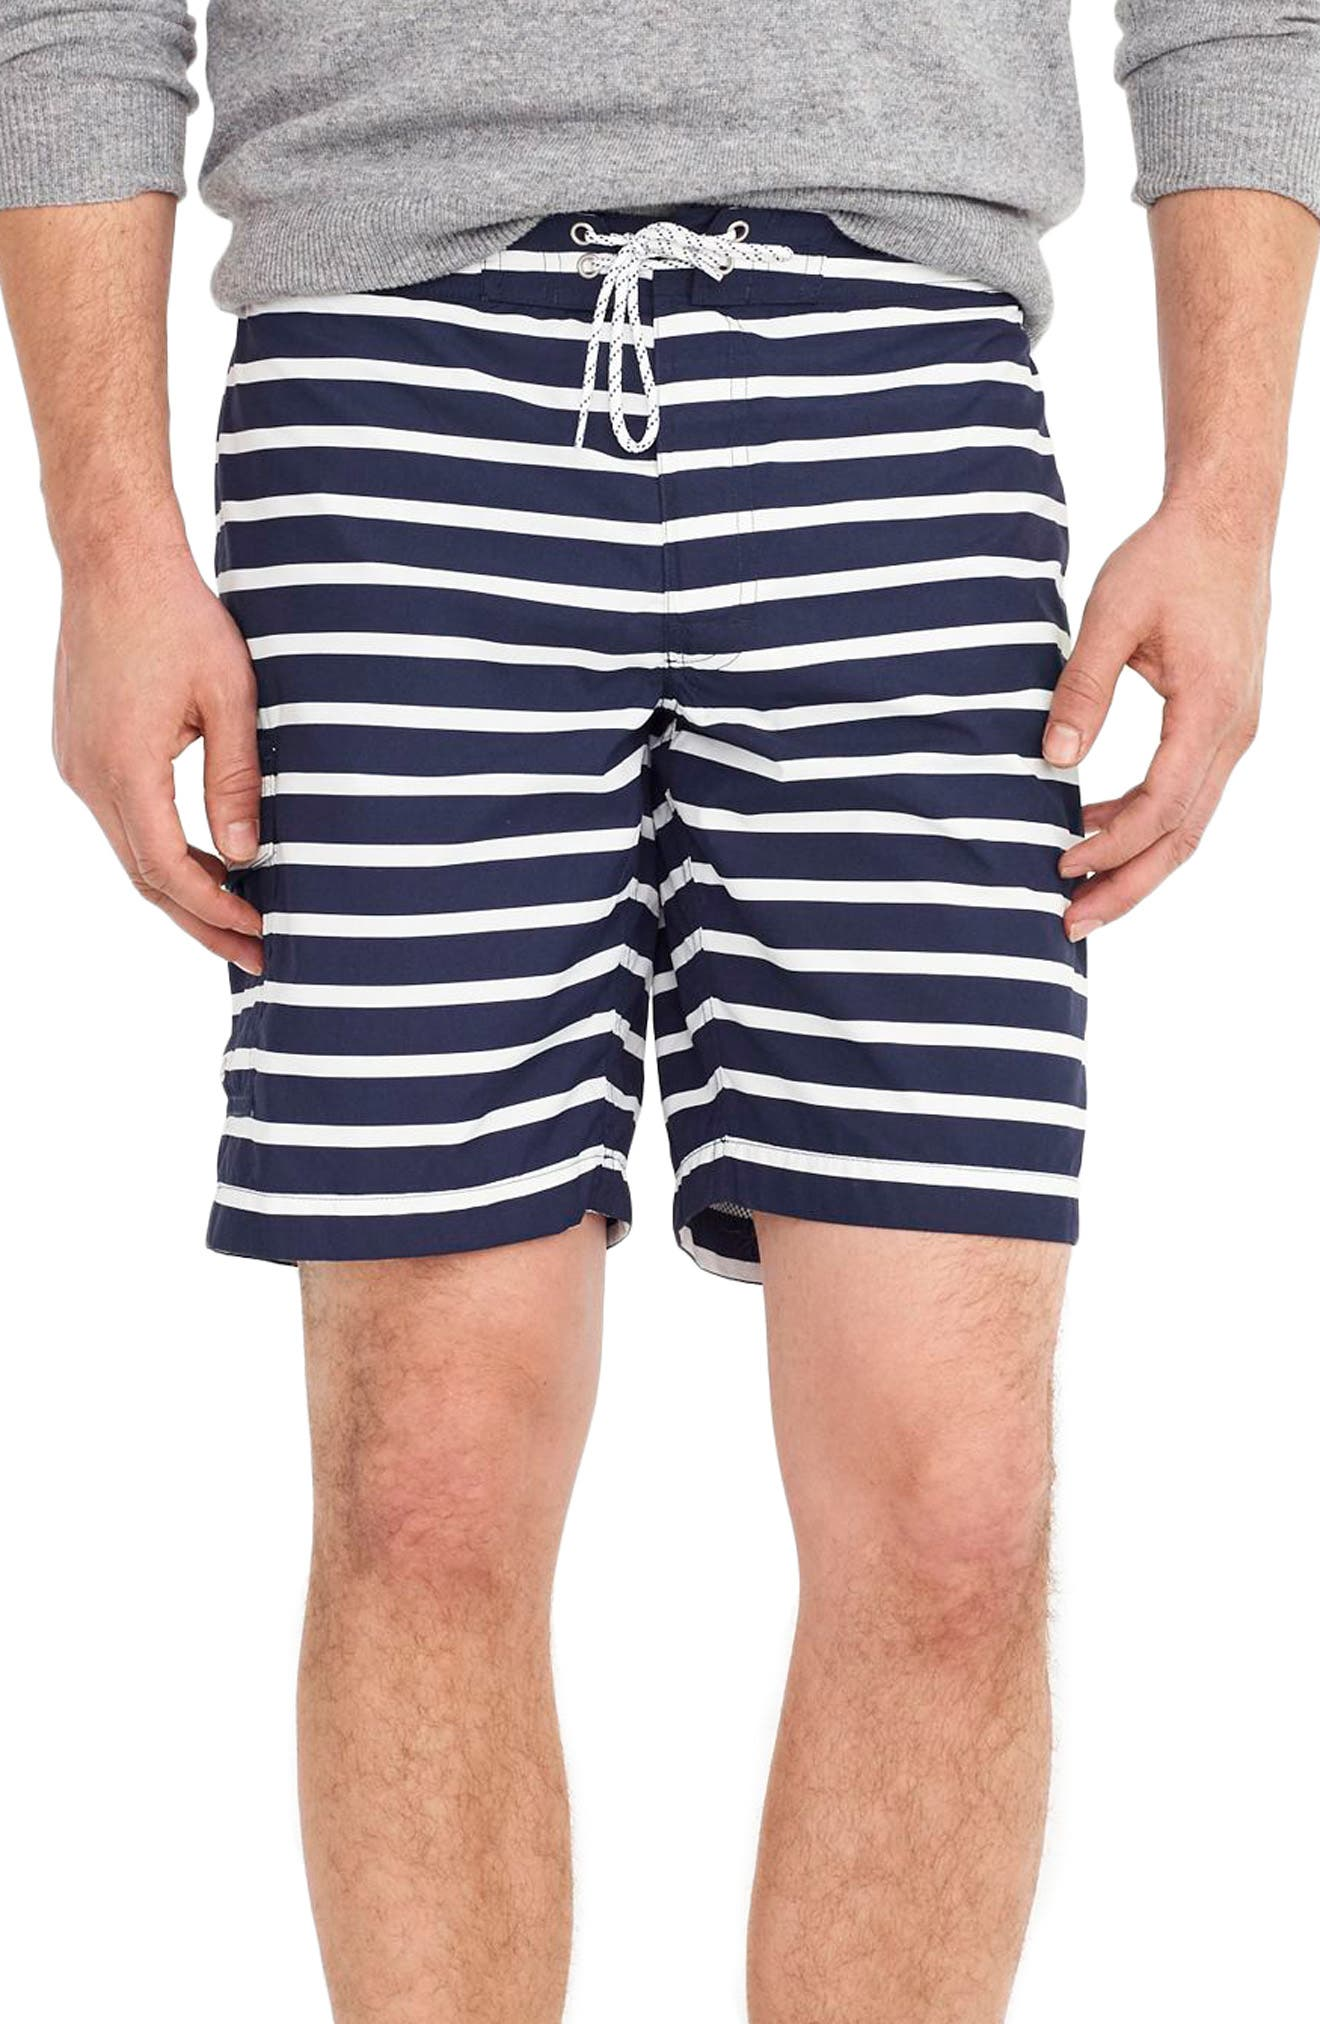 J.Crew Stripe Swim Trunks,                             Main thumbnail 1, color,                             Navy White